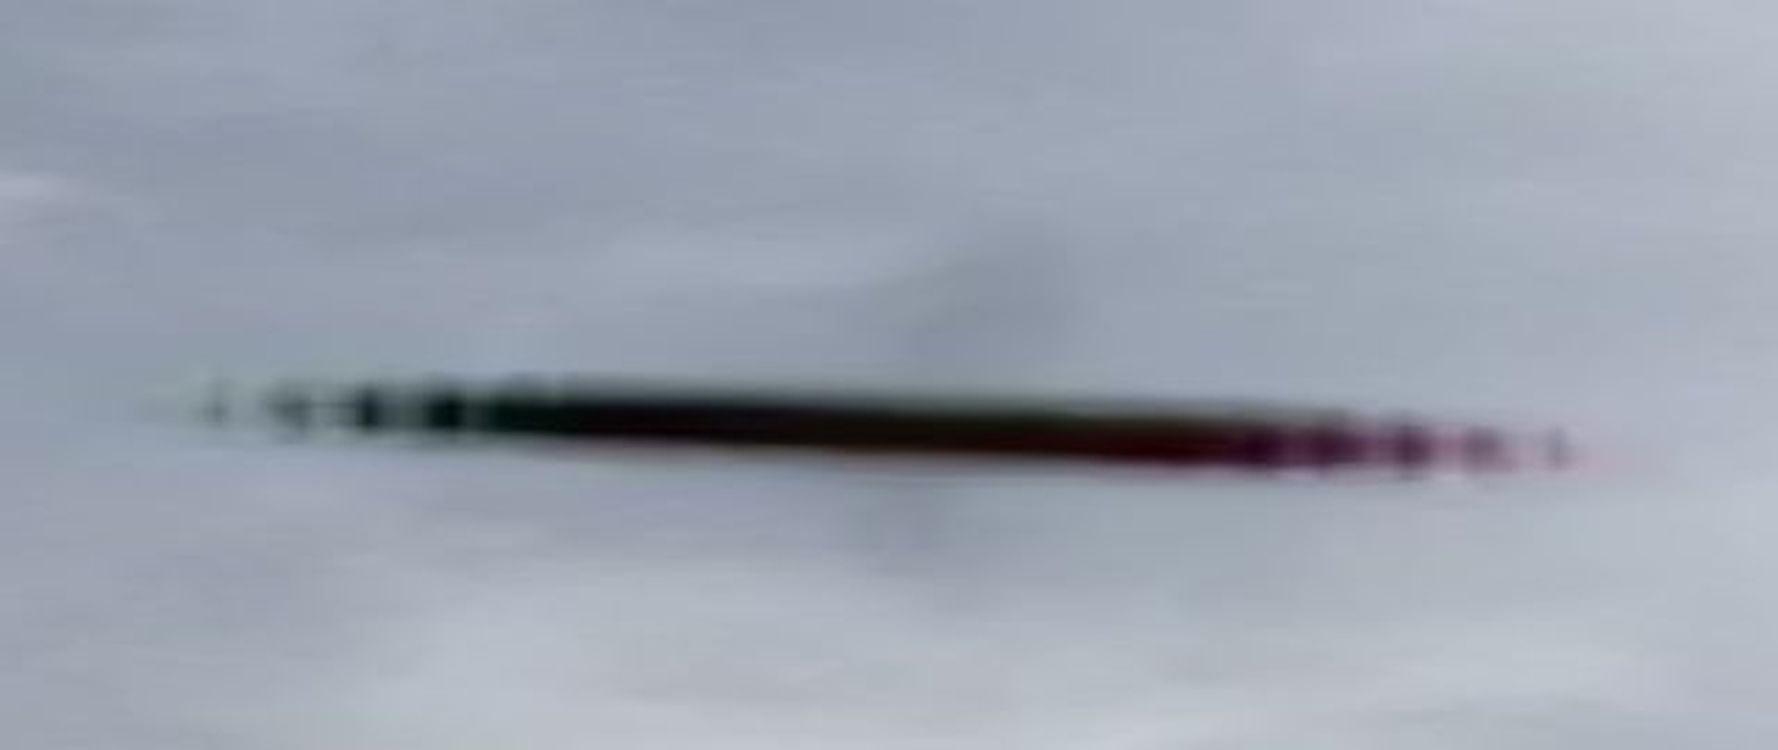 Raro fenómeno aéreo no identificado visto sobre Sun City, Arizona